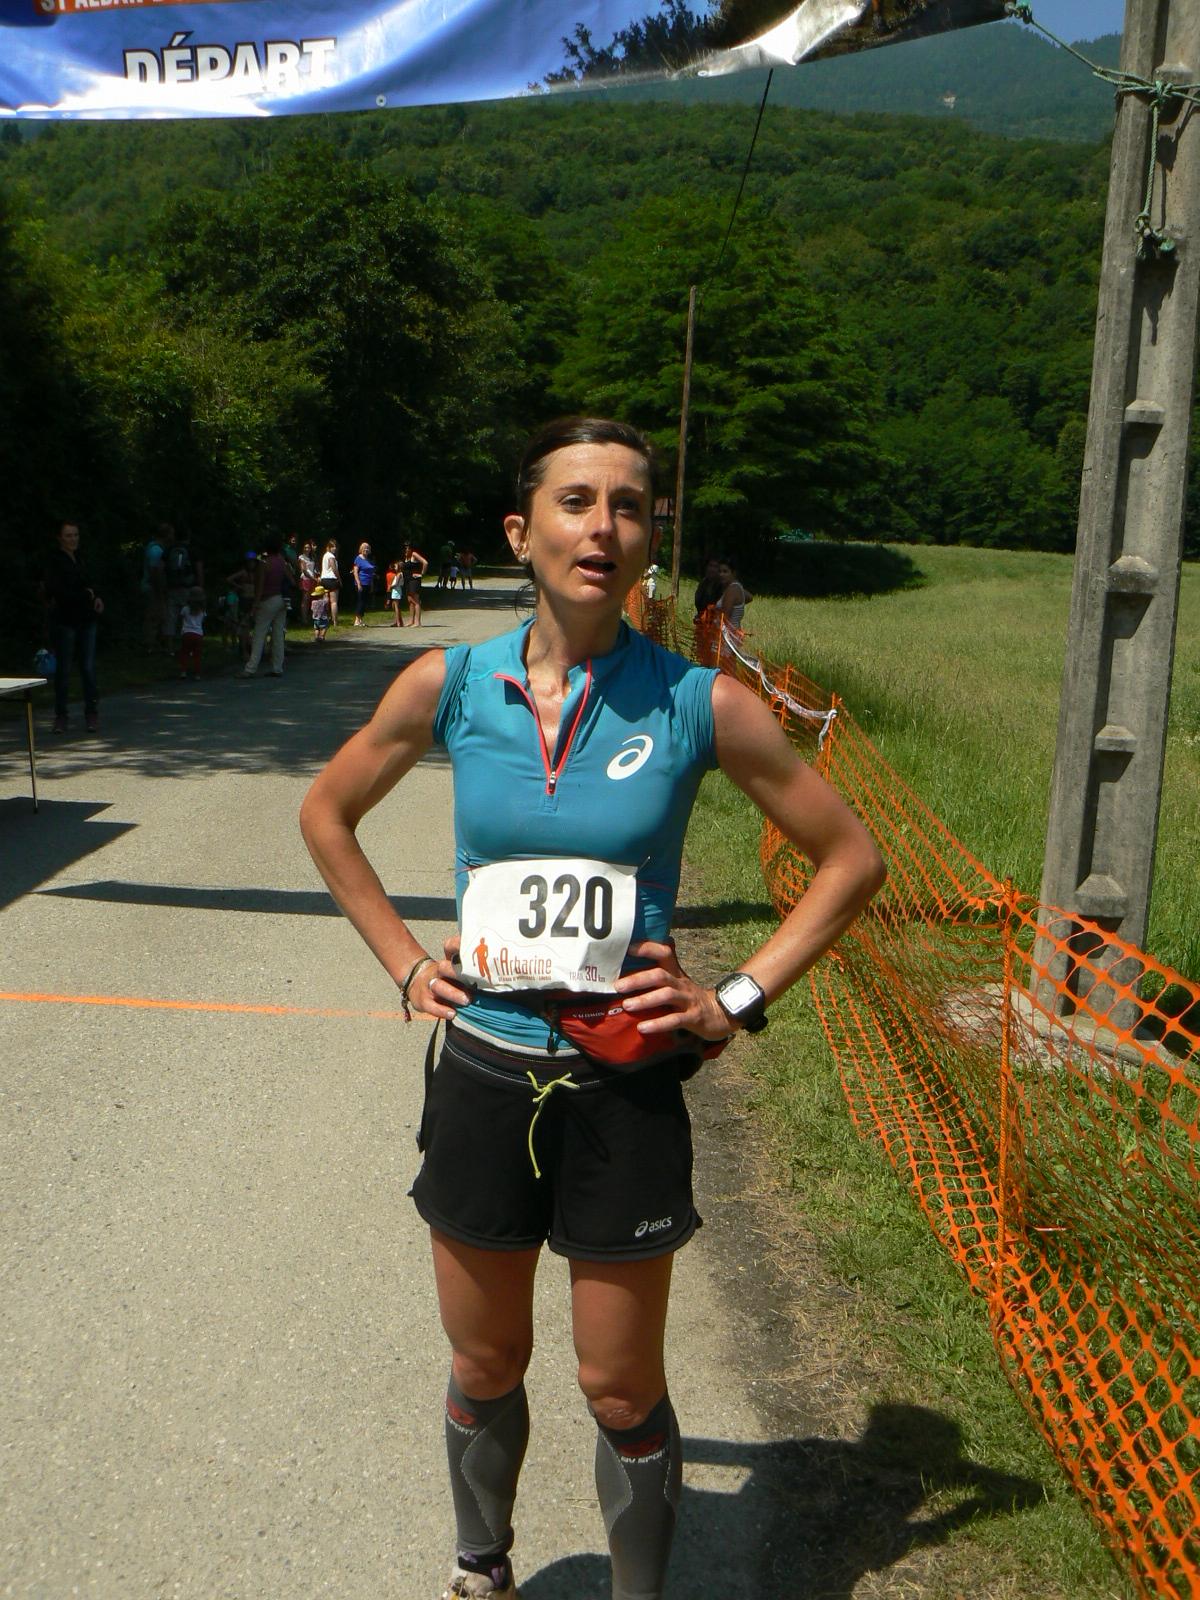 Marie Dohin 2  - RESULTATS, COMPTE RENDU ET PHOTOS DE L'ARBARINE / 07-06-15